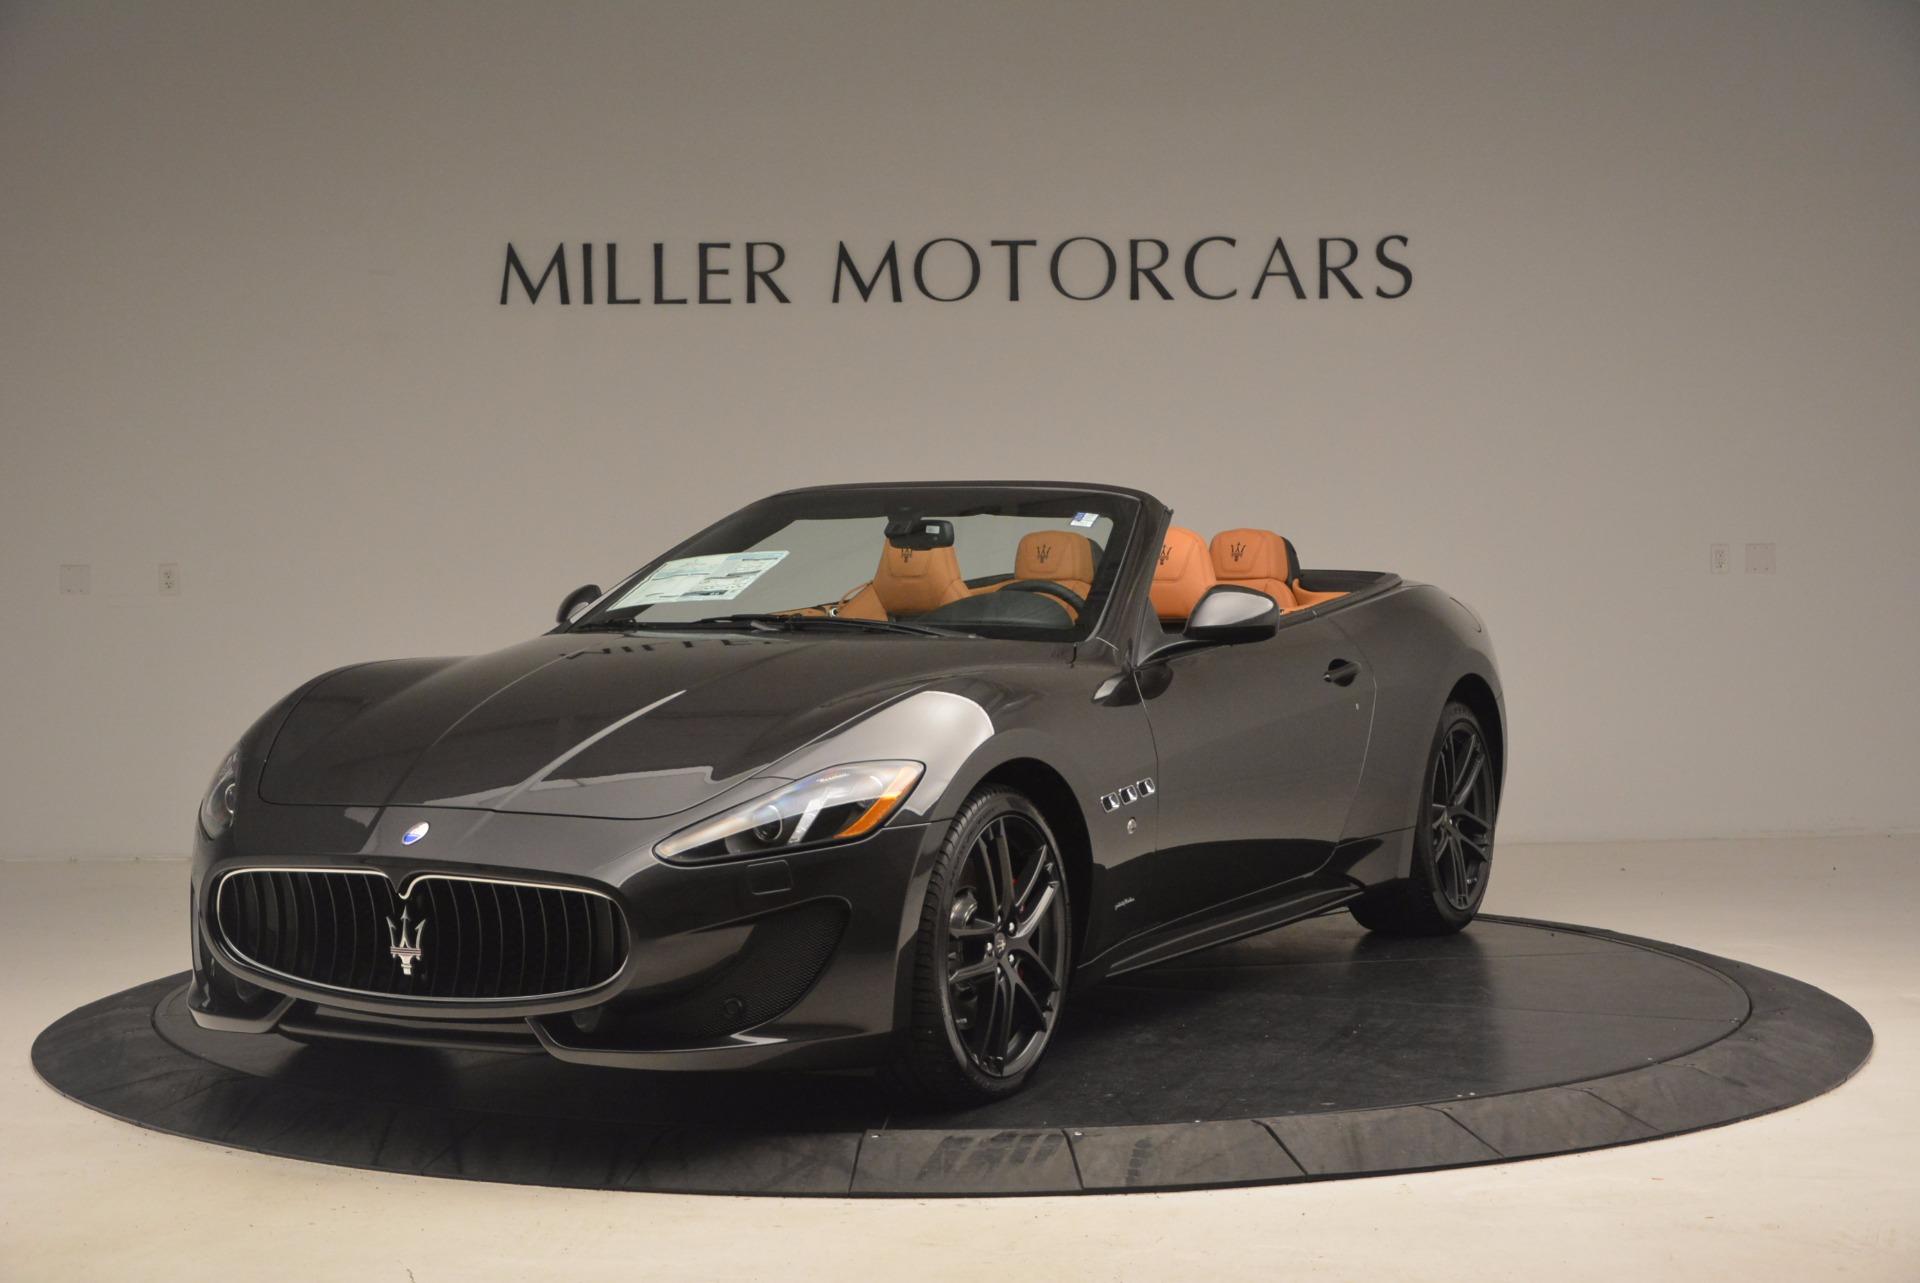 New 2017 Maserati GranTurismo Sport For Sale In Westport, CT 1154_main